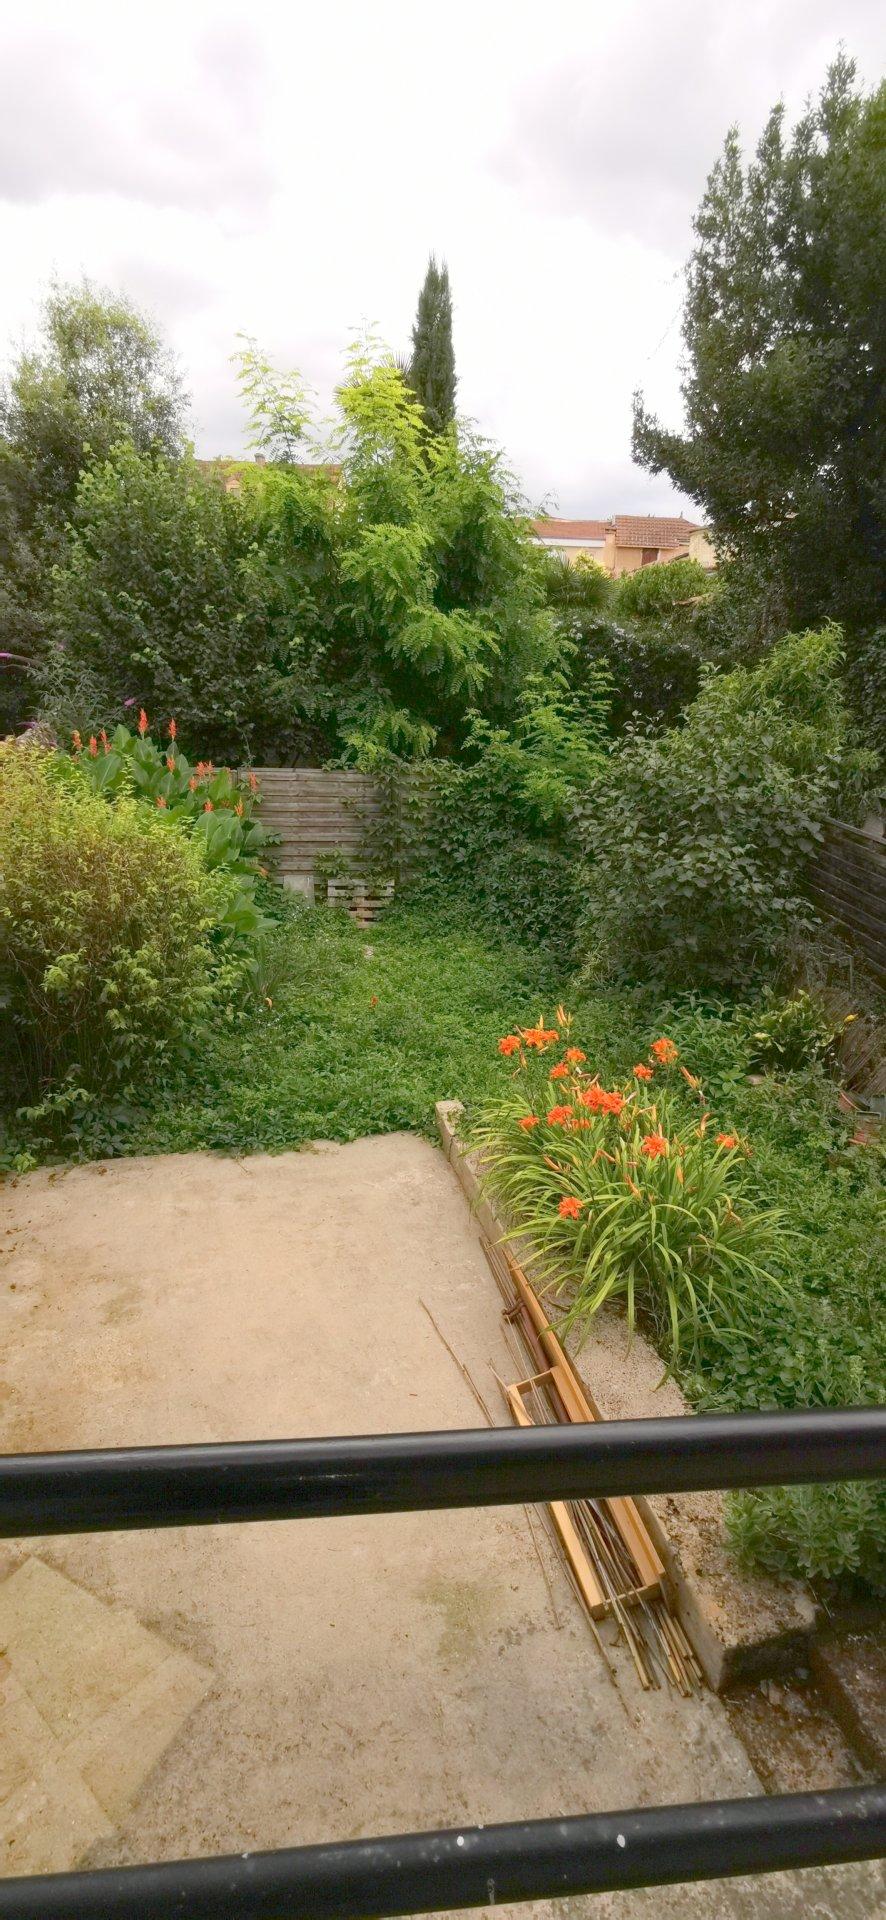 Maison années 1930 rénovée avec jardin